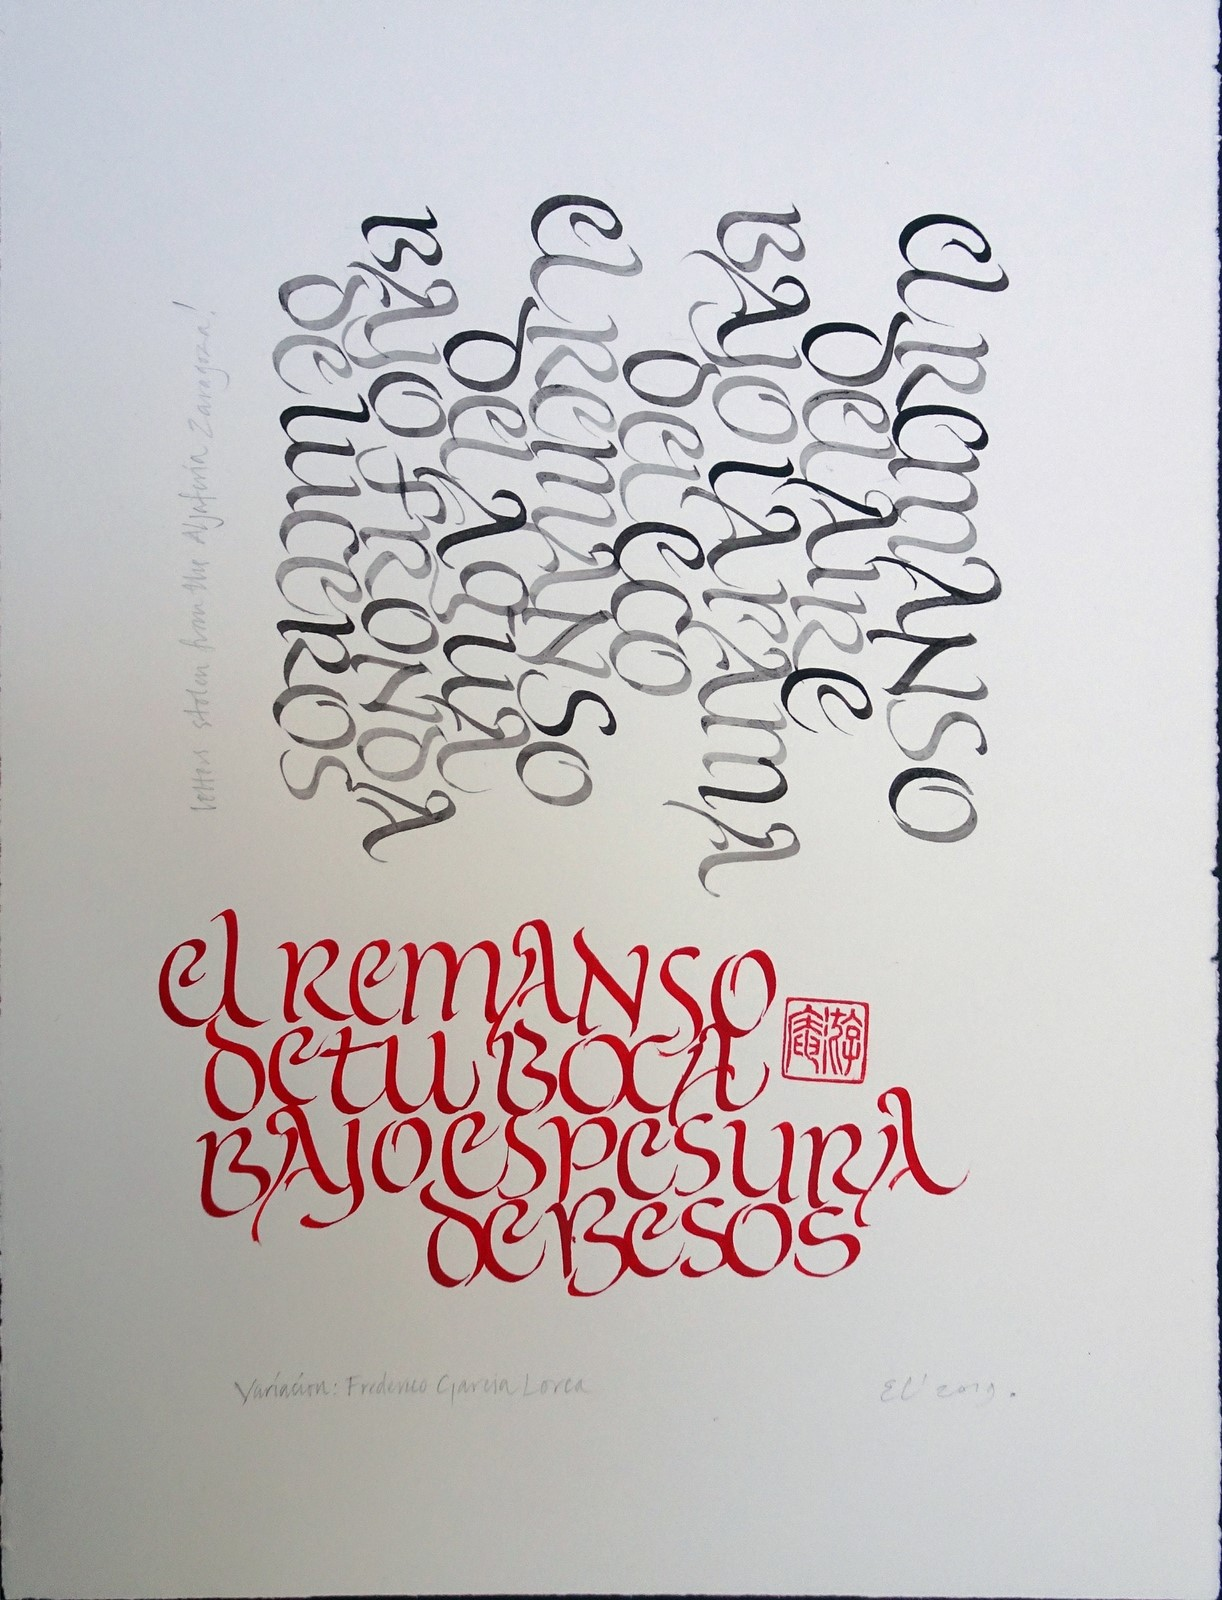 "<p><span lang='EN-US'>'Federico Garcia Lorca'nın Varyasyonu"",</span><span lang='EN-US'>Sumi and Vermilion on</span><span lang='EN-US'>Zerkal Kağıt Üzerine Kaligrafi Uç ile Çalışma,</span><span lang='EN-US'>265x352 mm, 2019.<br /></span><em><span lang='EN-US'>""Variación by Frederico Garcia Lorca"",</span></em><em><span lang='EN-US'>Sumi and Vermilion on</span></em><em><span lang='EN-US'>Zerkal Paper with Speedball nib.,</span></em><em><span lang='EN-US'>265x352 mm, 2019.</span></em></p><p><span lang='EN-US'>Aljaferia, Zaragoza, İspanya'daki frizlerden esinlenilen yazı.<br /></span><em><span lang='EN-US'>Lettering inspired by friezes in the Aljaferia, Zaragoza, Spain.</span></em></p><p></p>"